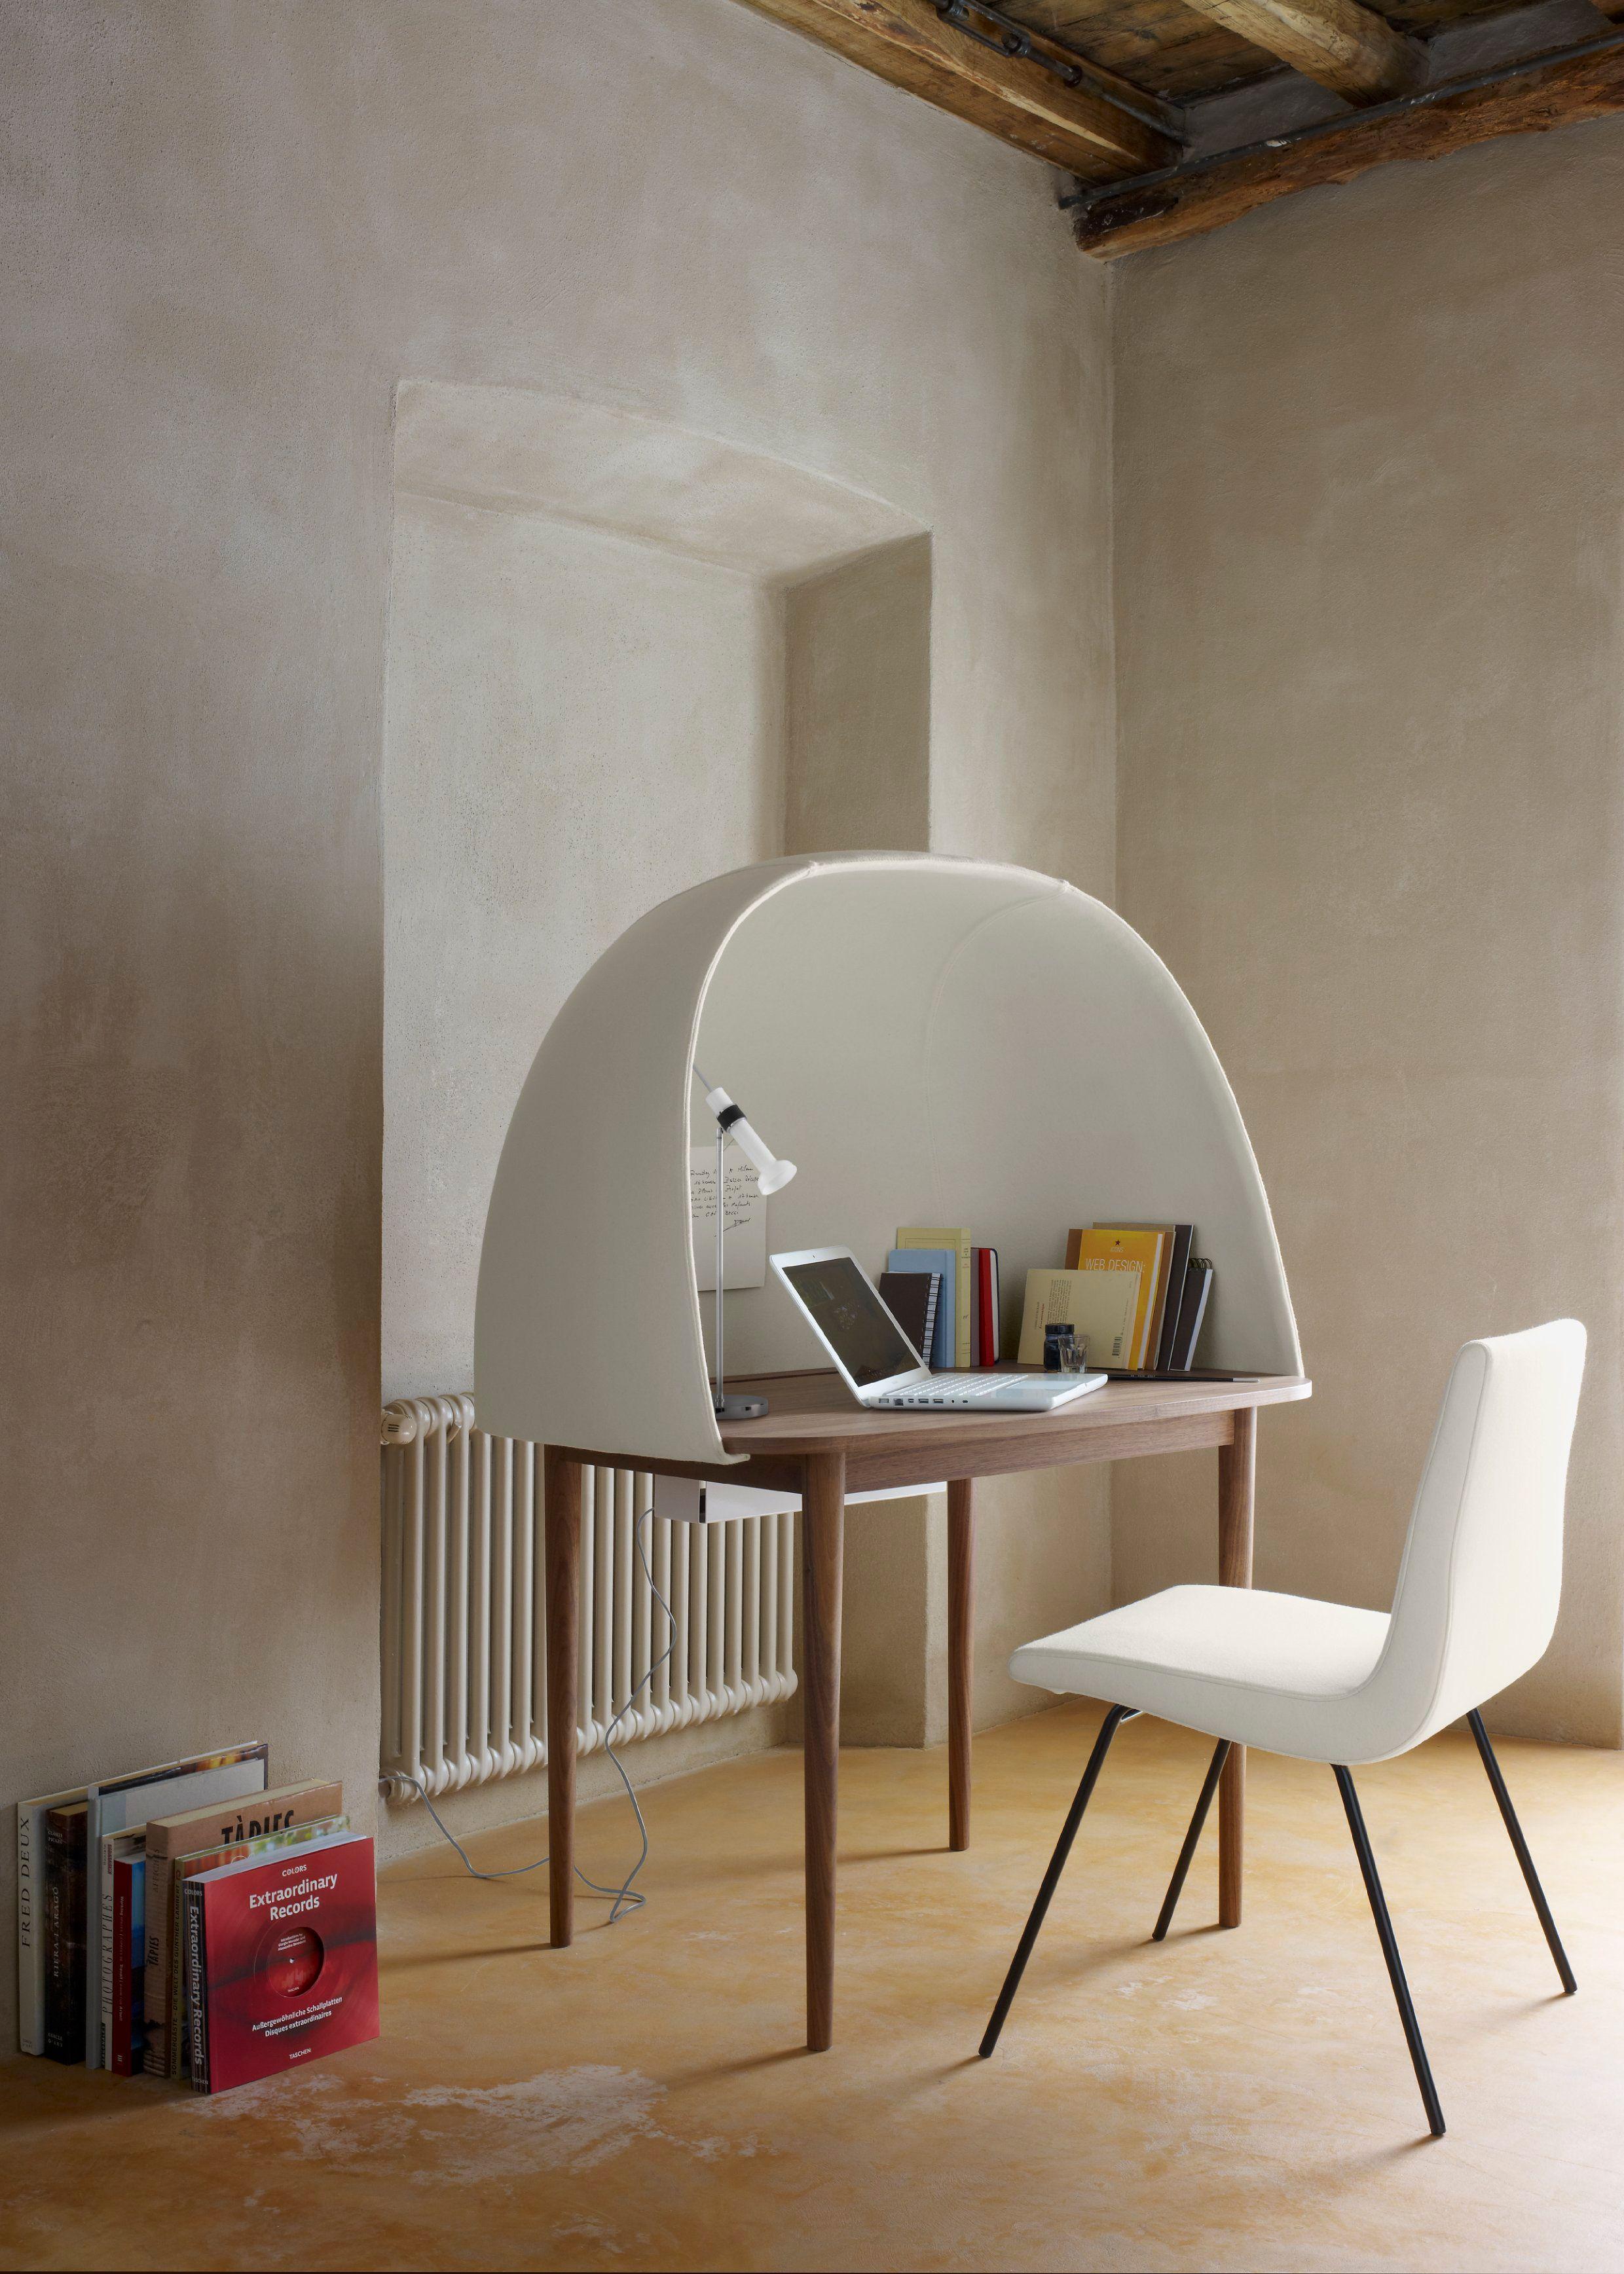 Rewrite Desk Designed By GamFratesi For #LigneRoset | Available At Linea  Inc. Modern Furniture Los Angeles. (www.linea Inc.com / Info@linea Inc.com)  ...